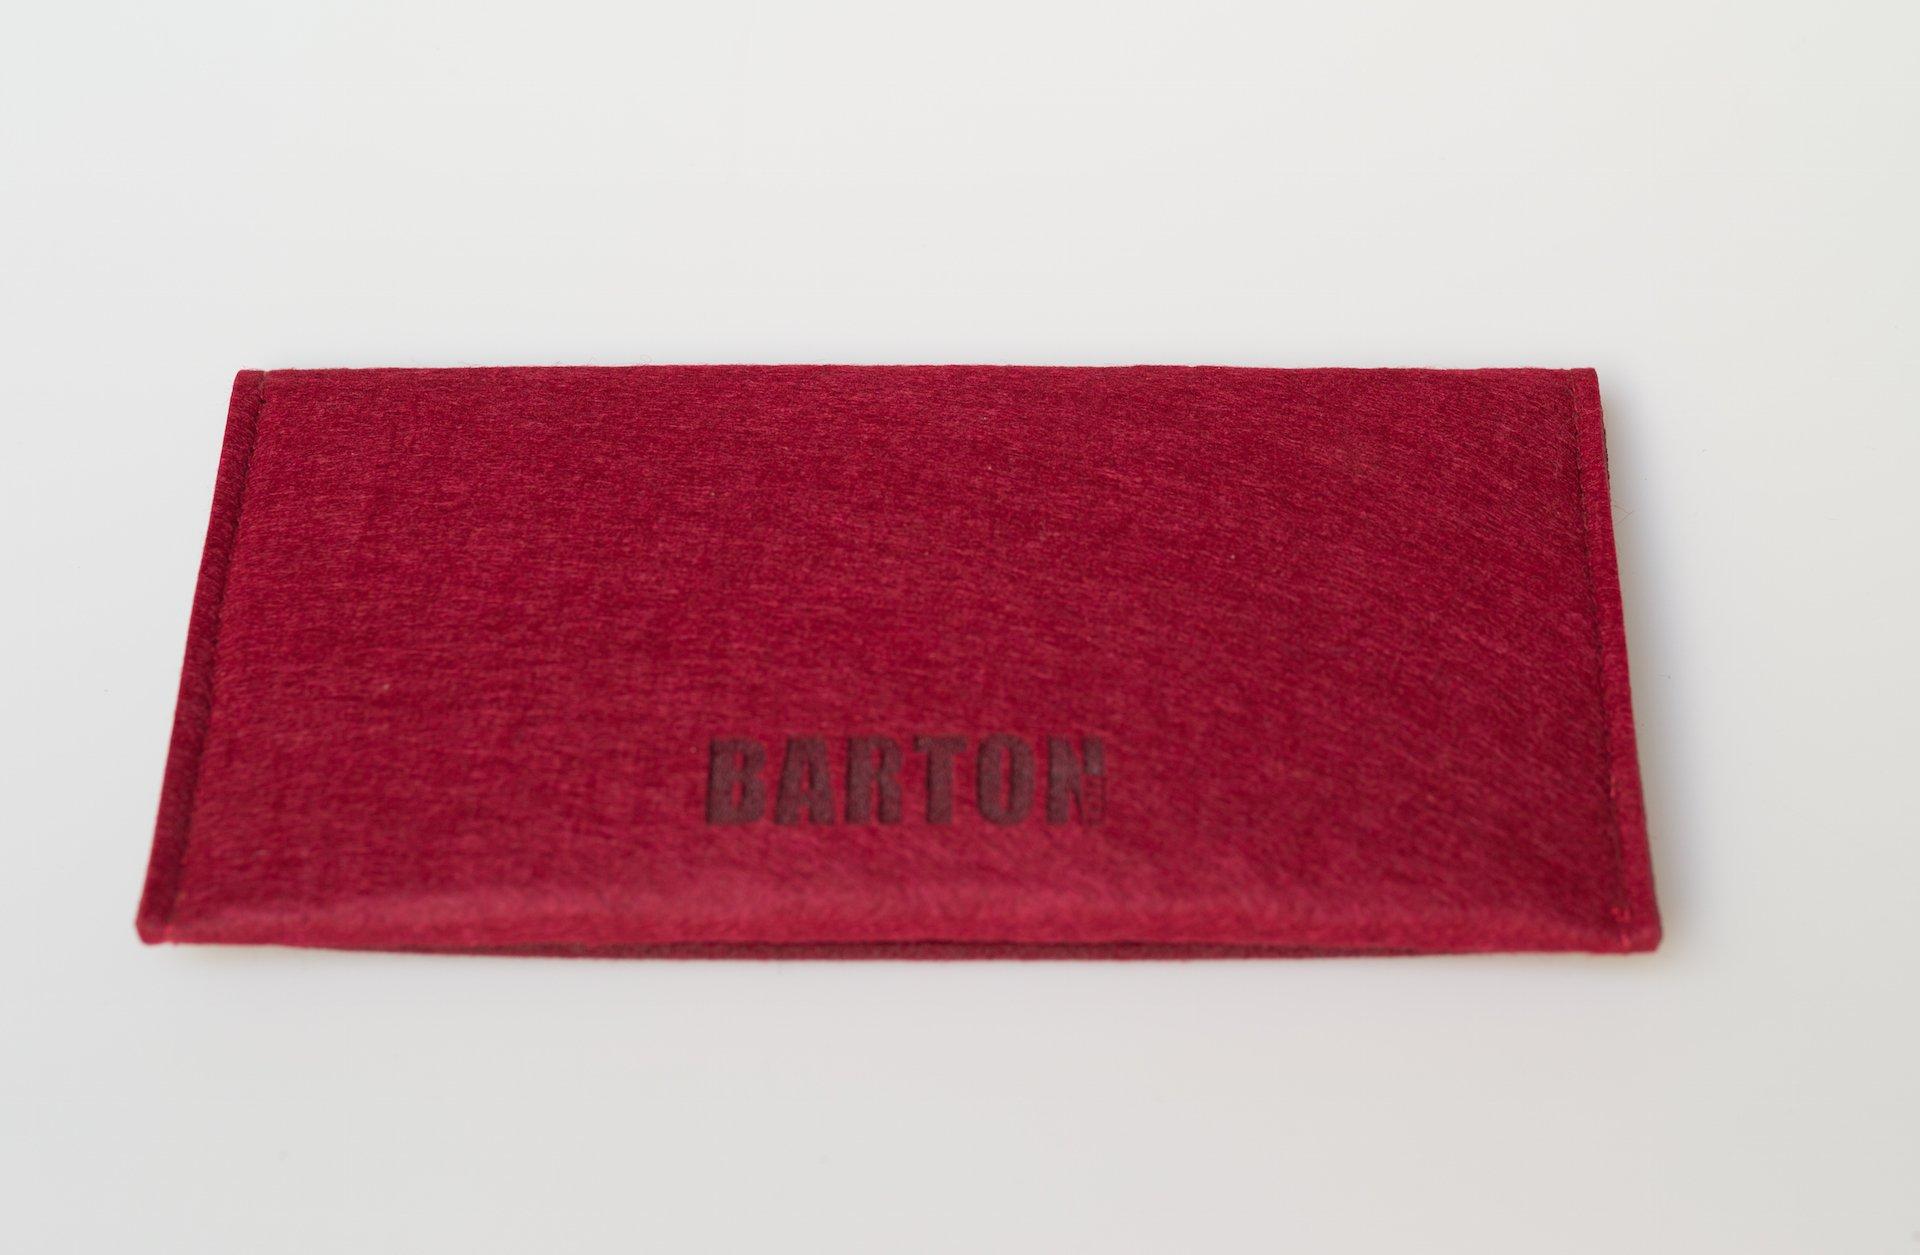 Barton 1972 Pitch Black Braided Leather 1972 XL 50'' (125cm) Leica Sony Fuji Luxury Designer Barton1972 Top Grain Leather by Barton 1972 (Image #8)